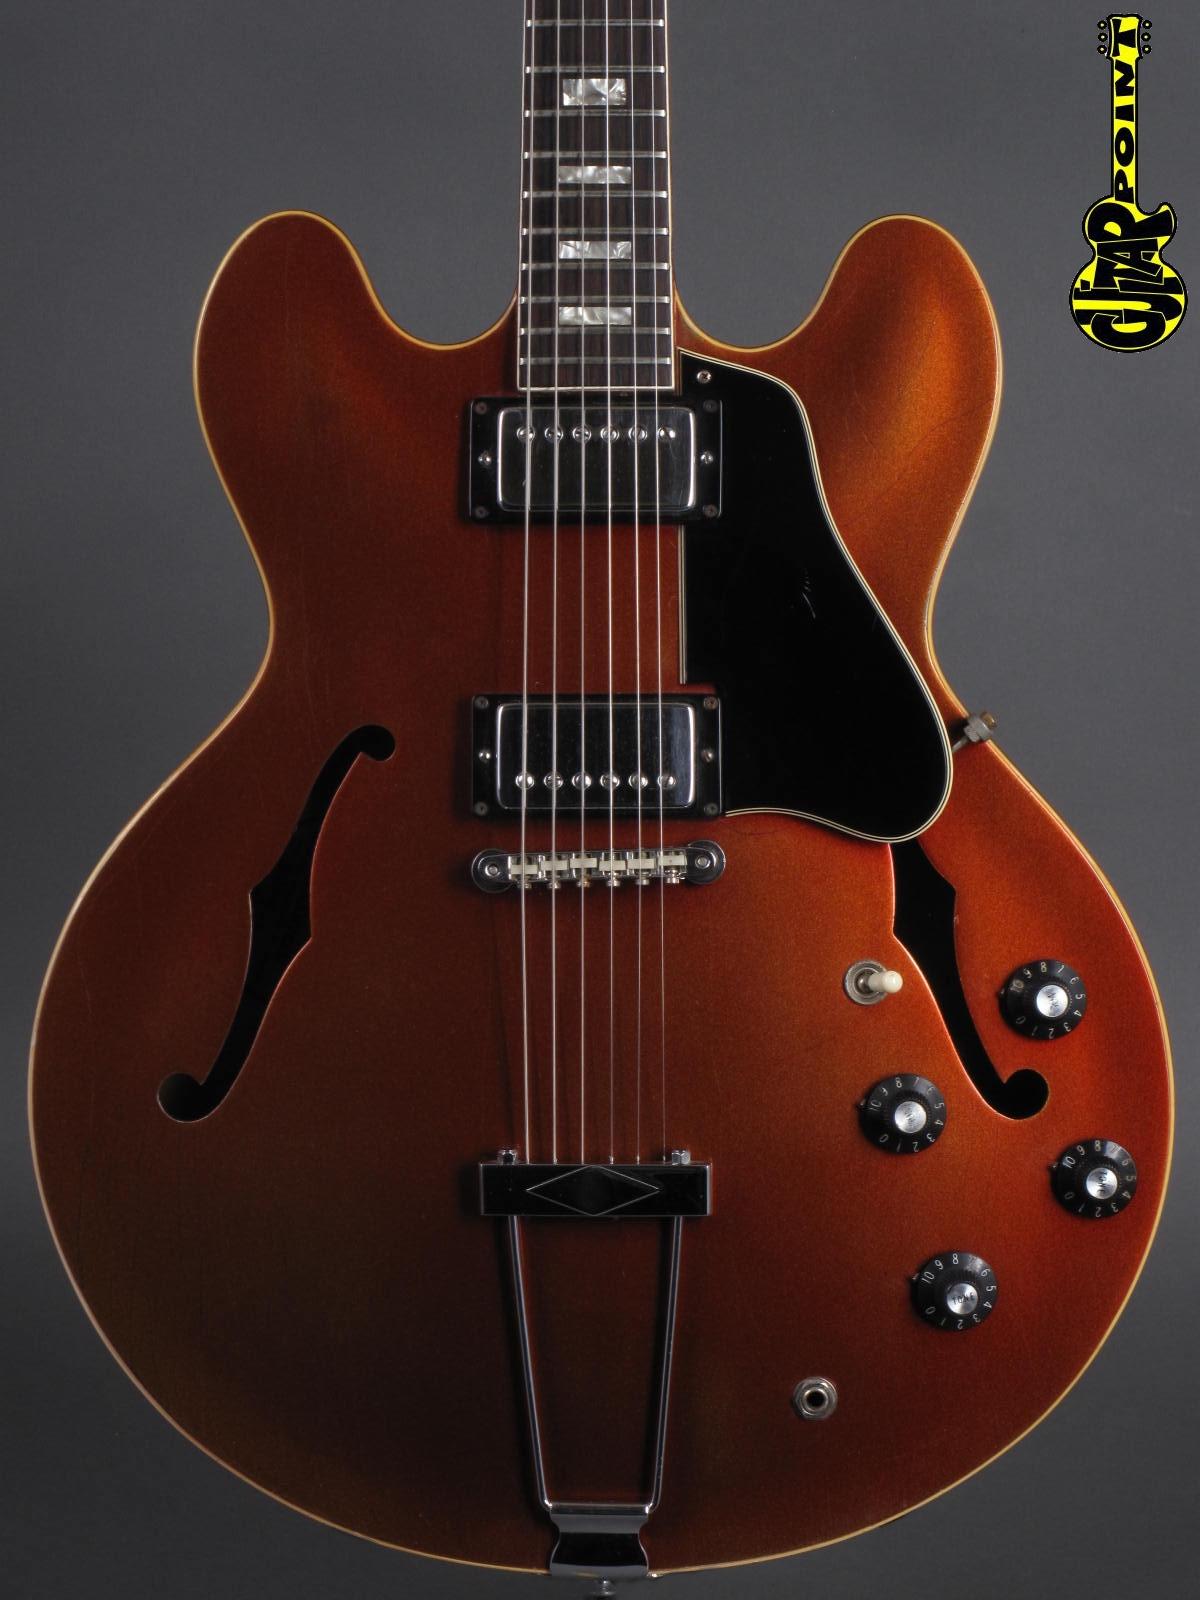 1967 Gibson ES-335 TD -  Sparkling Burgundy Metallic